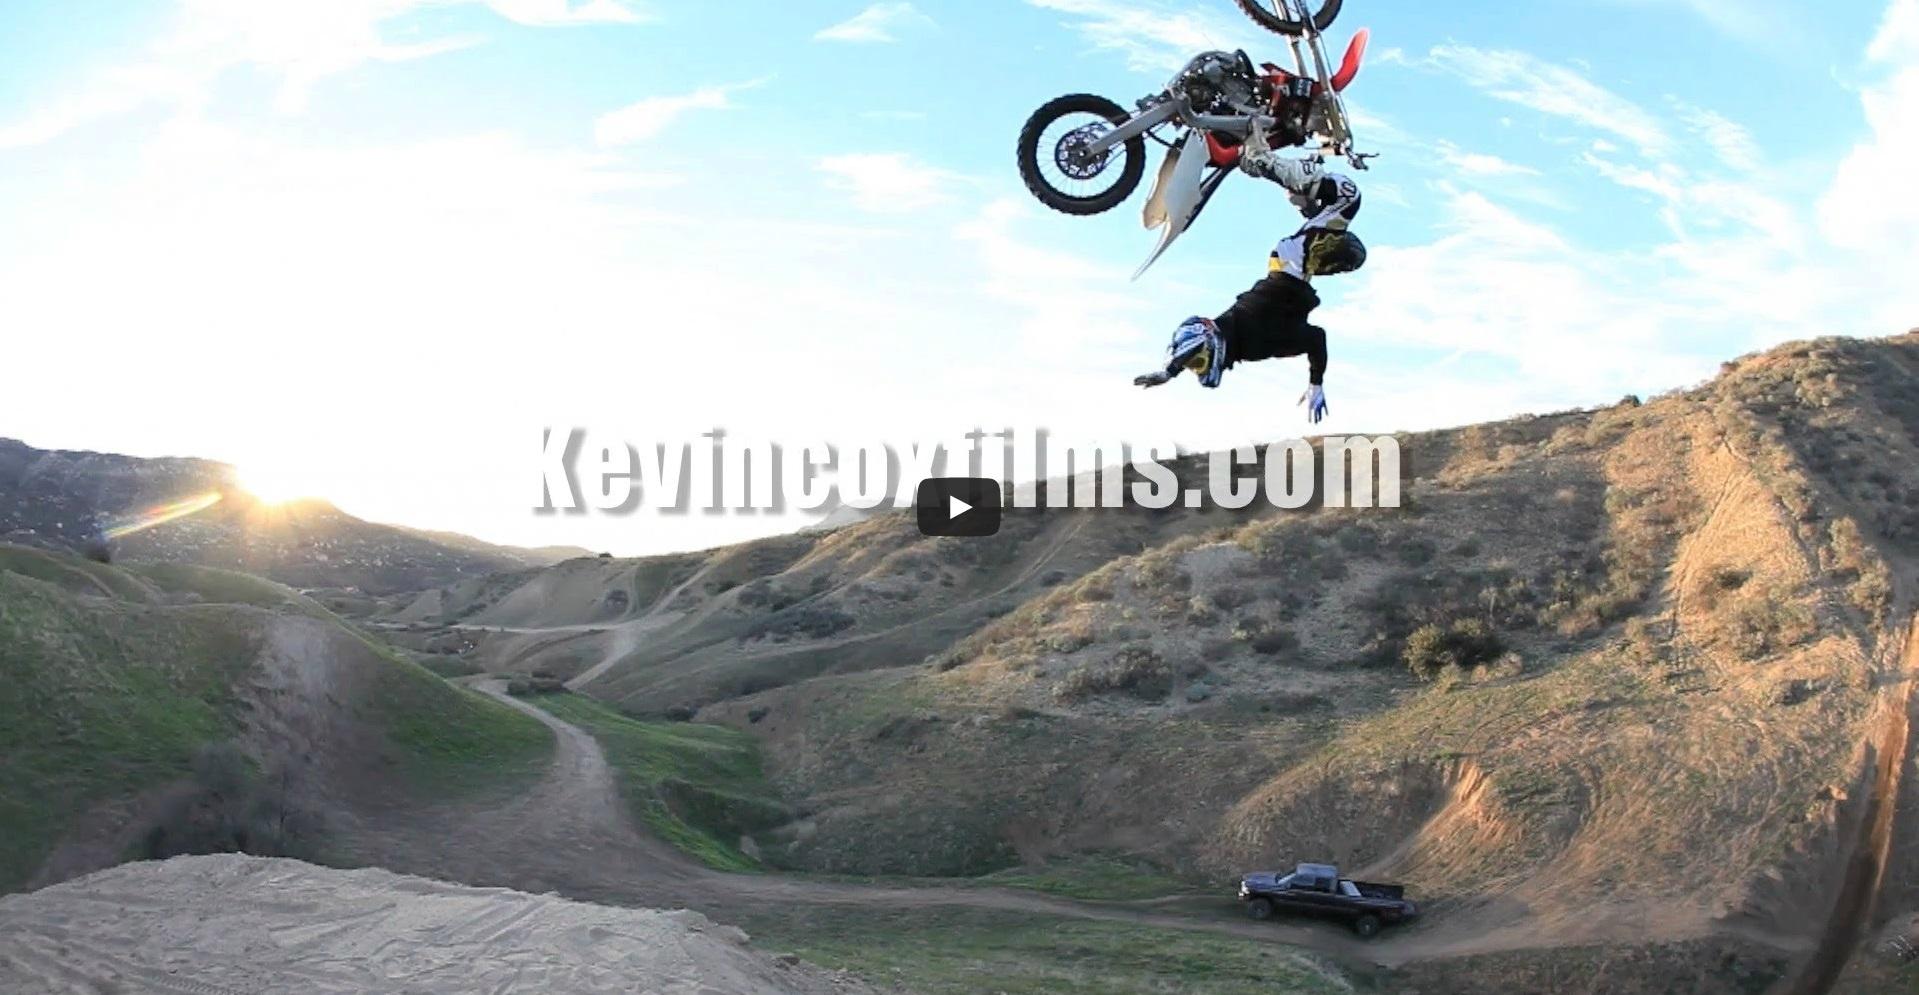 DBK rider Vinnie Carbone – Natural Terrain Backflips in the Hills!